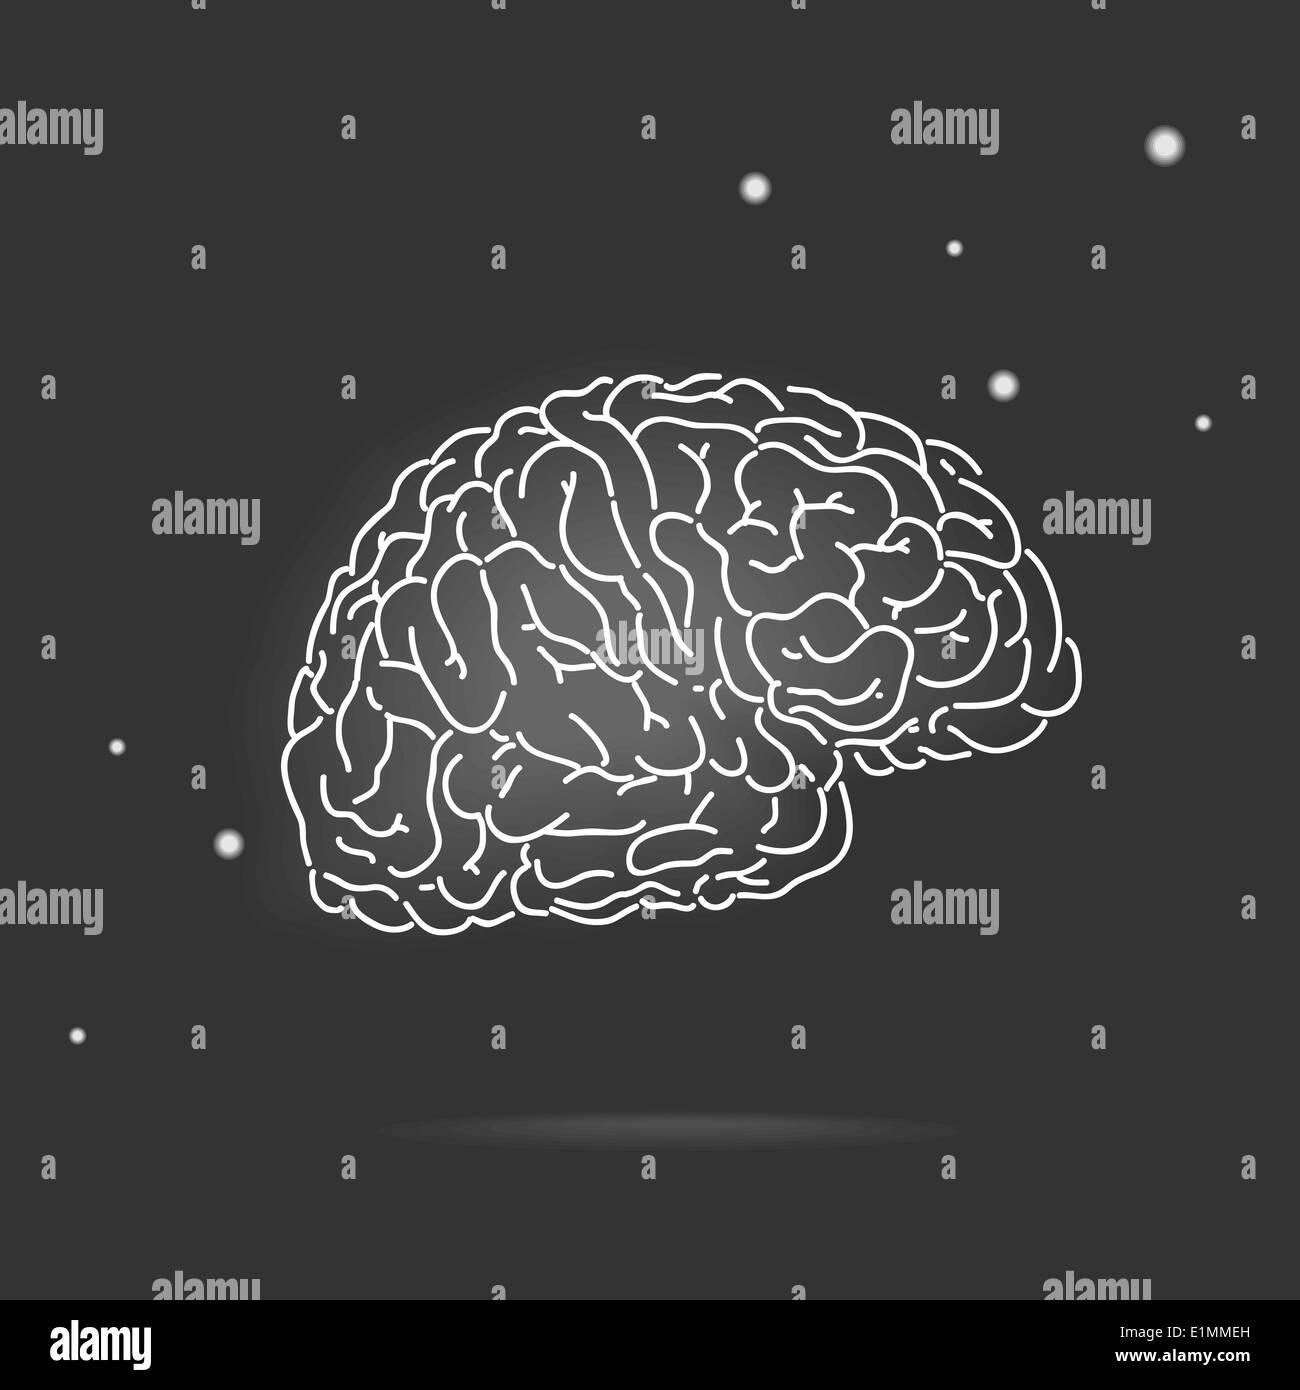 Mysterious brain - Stock Image